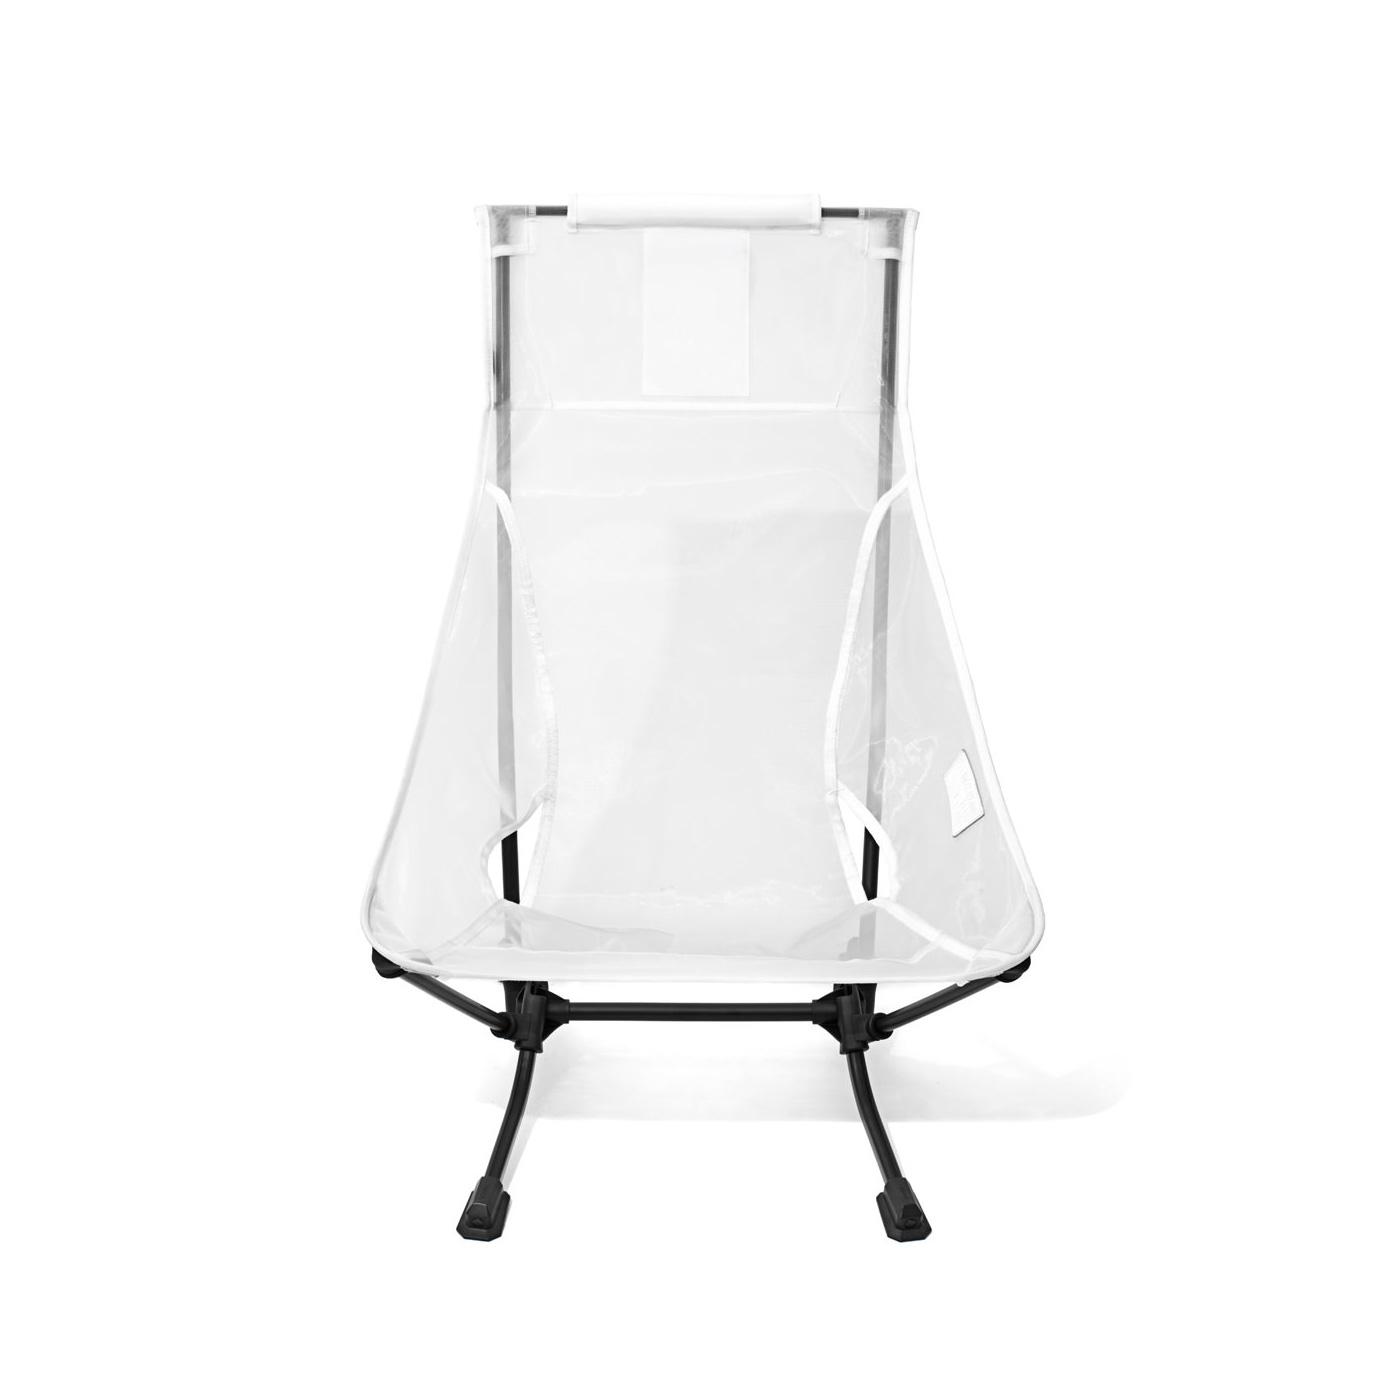 Helinox Summer Kit Sunset & Beach Chair